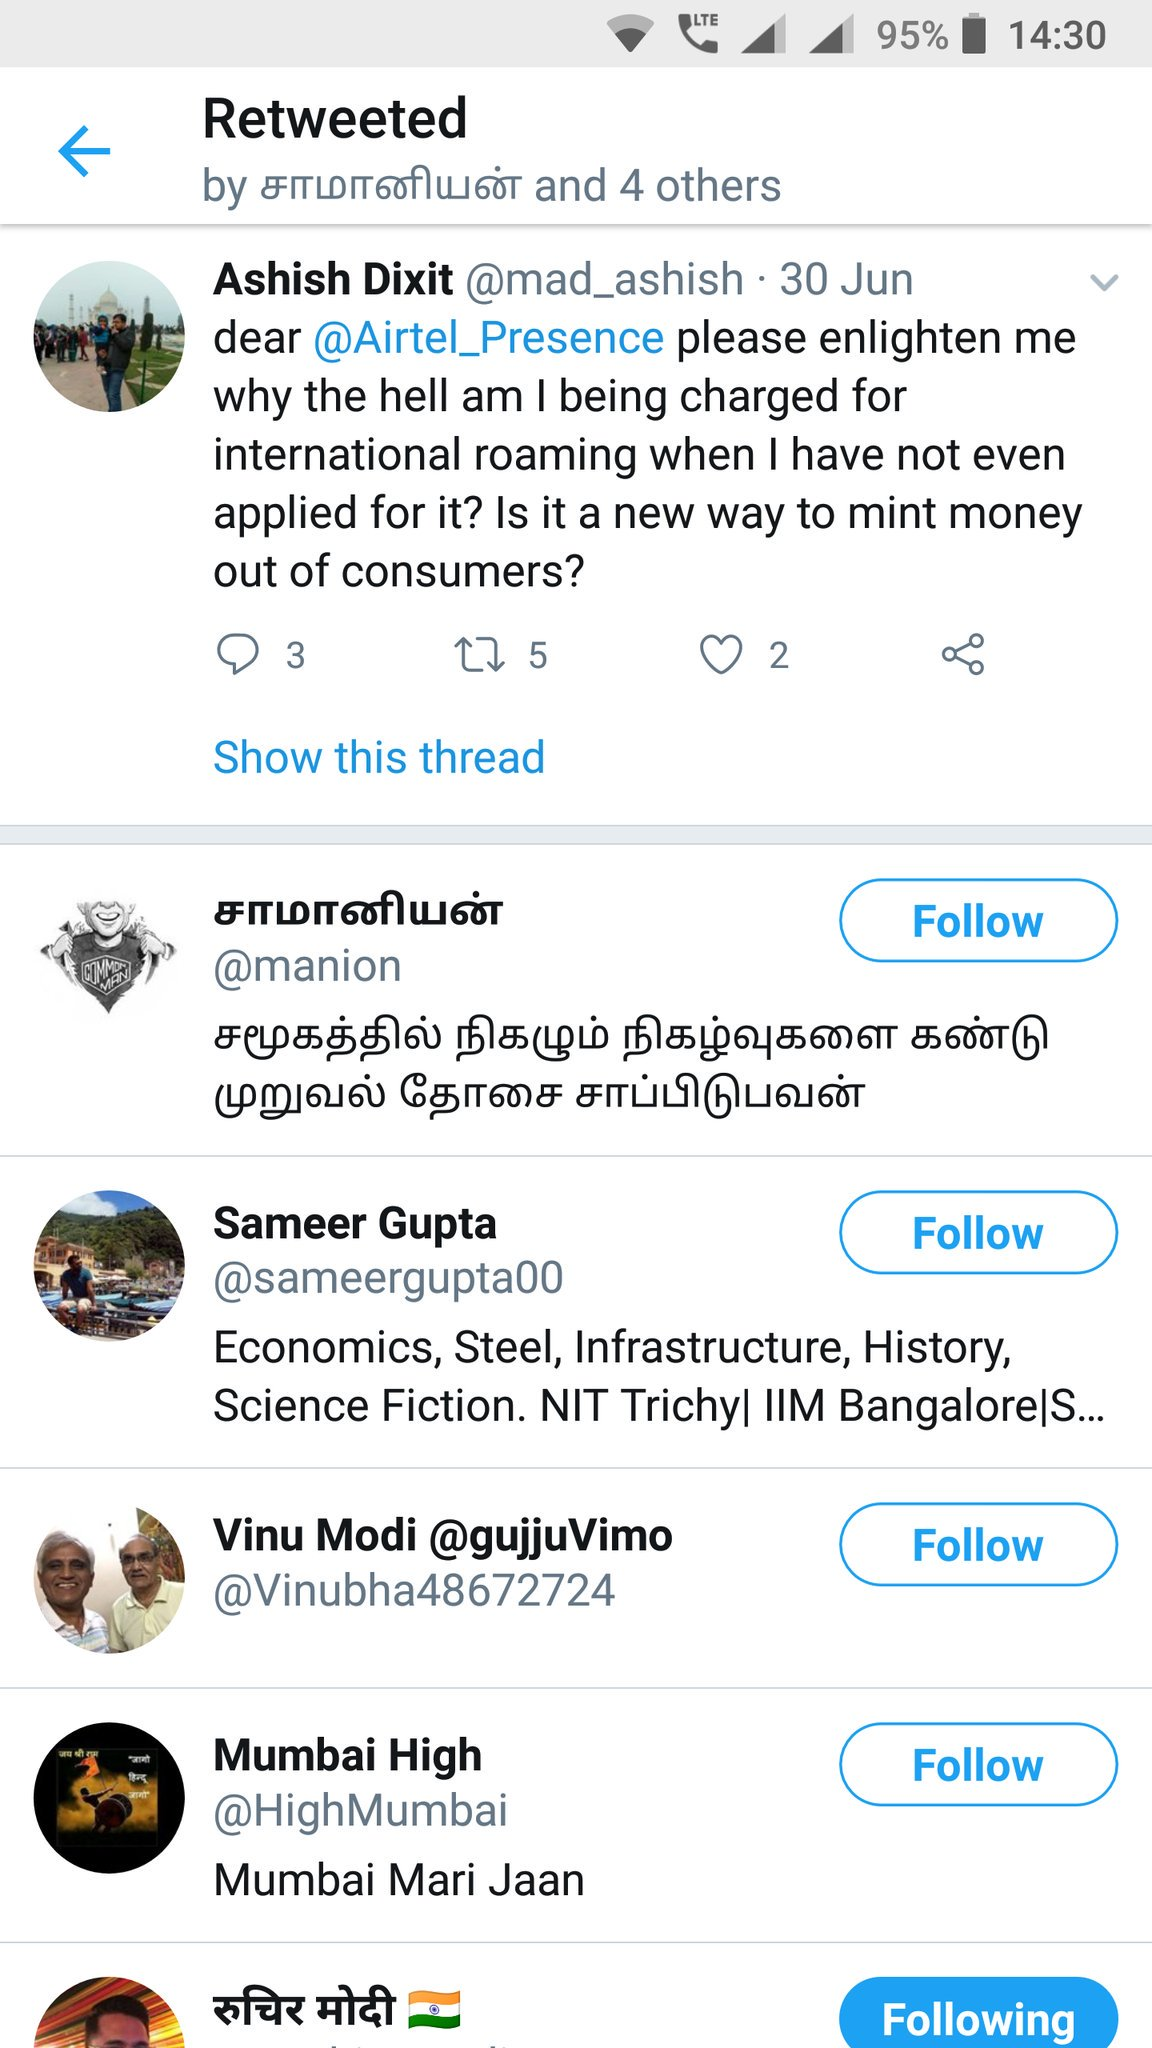 Ashish Dixit on Twitter: